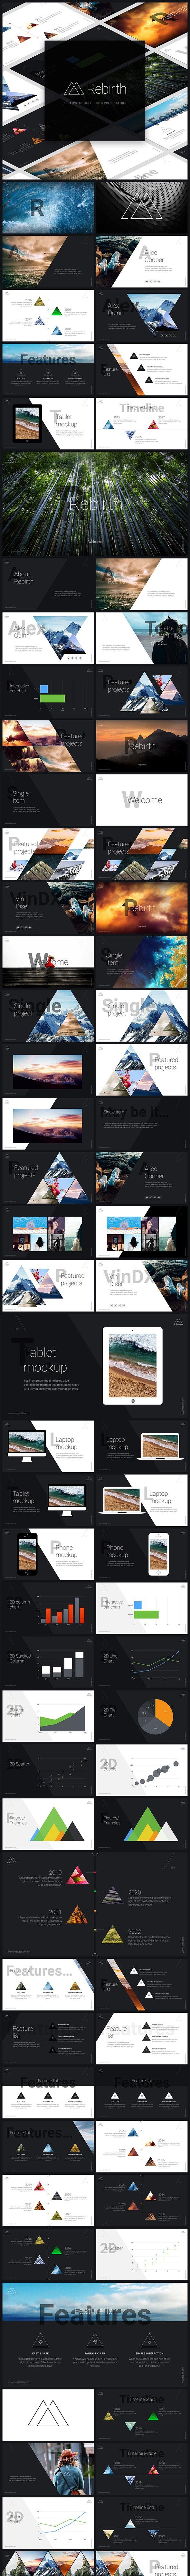 Rebirth Google Presentation - Google Slides Presentation Templates